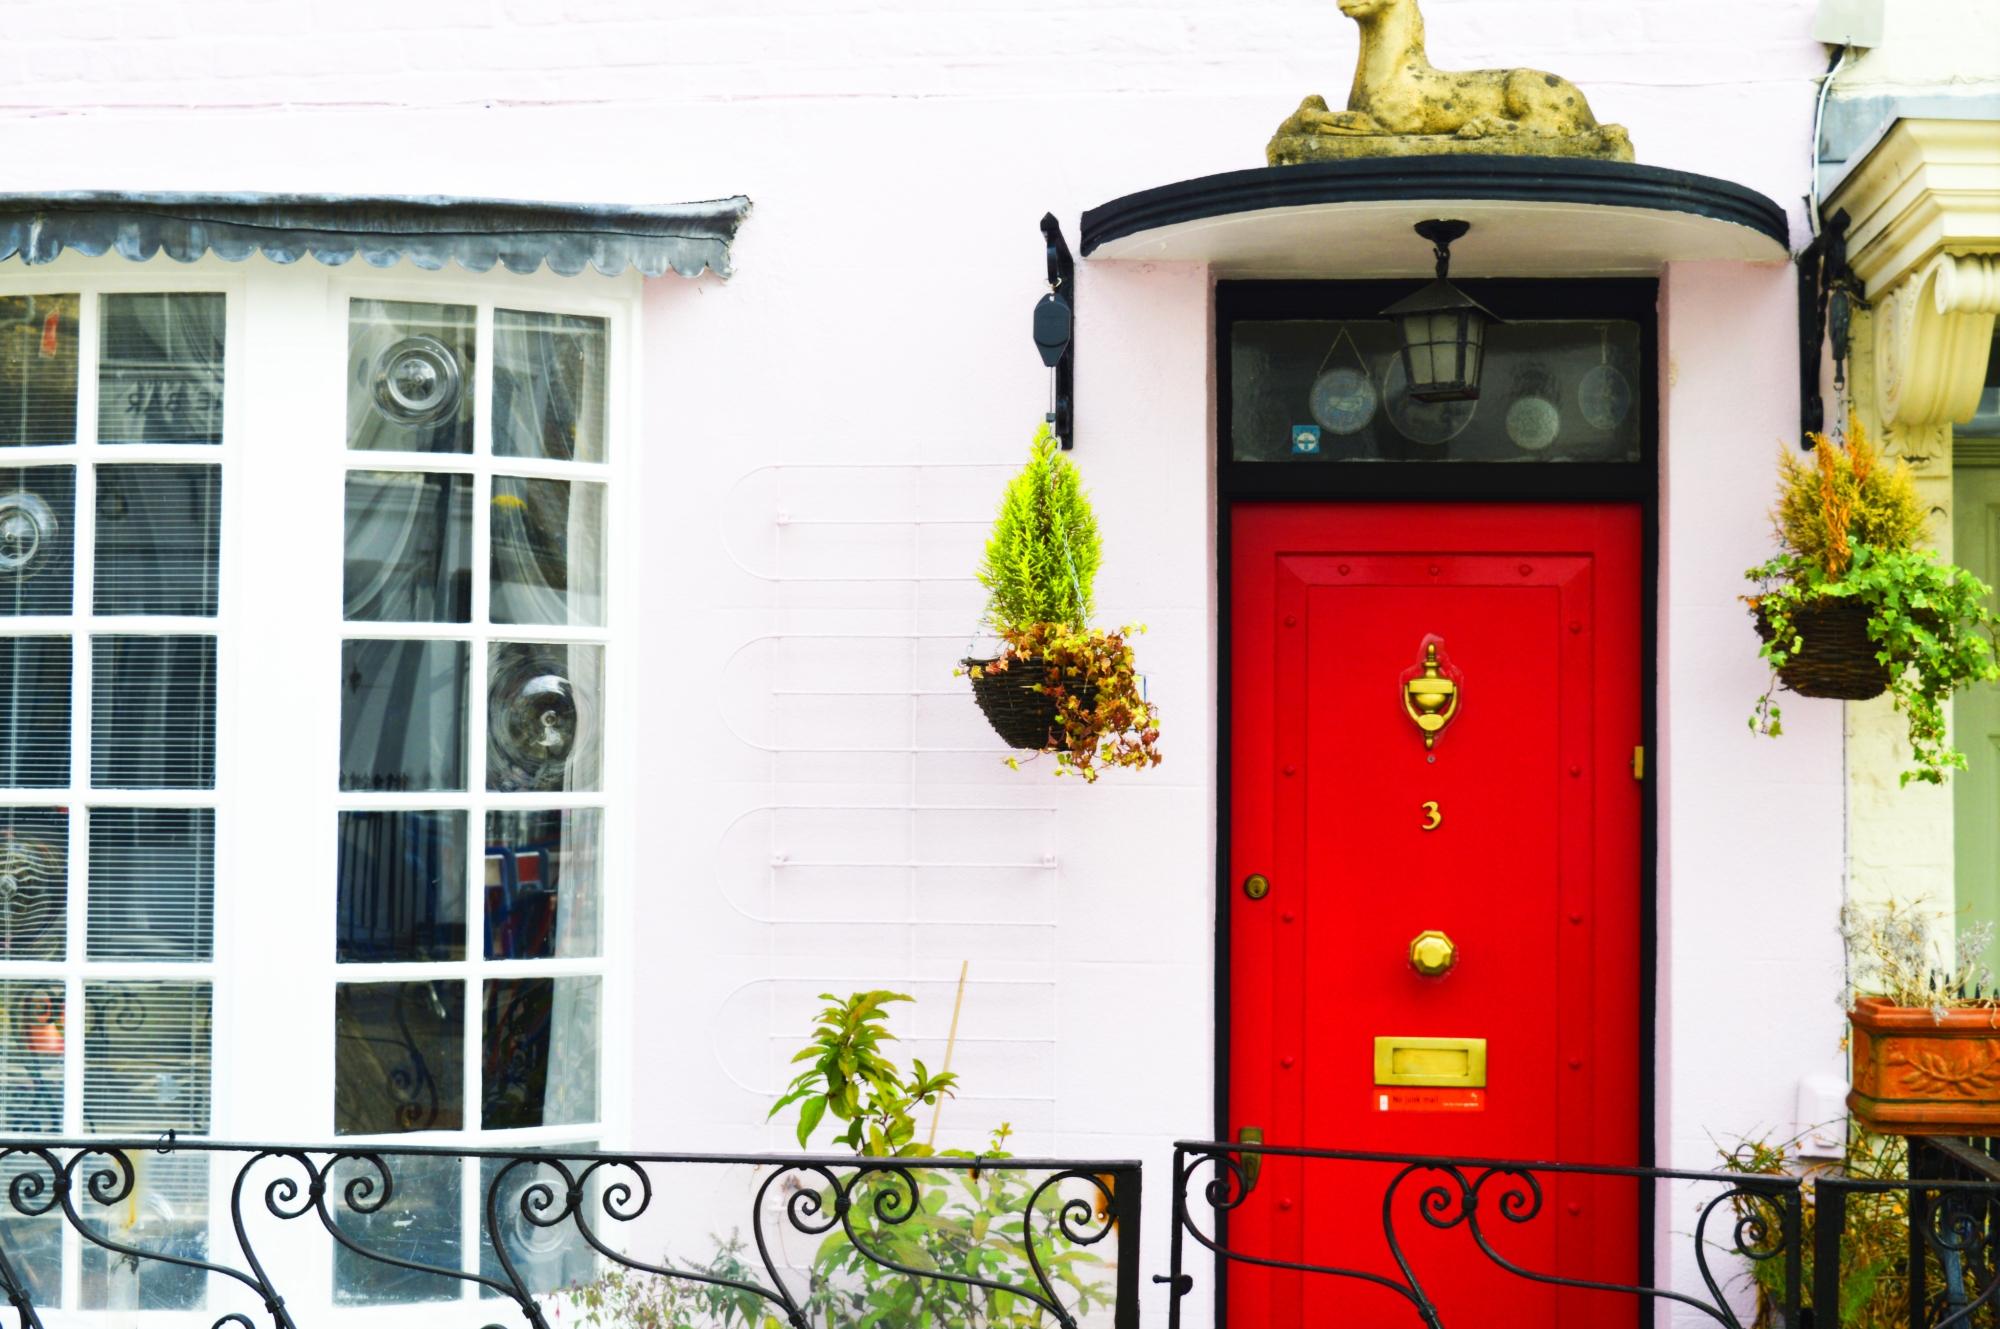 red door la porta rossa notting hill streets random portobello england london united kingdom uk canan çetin